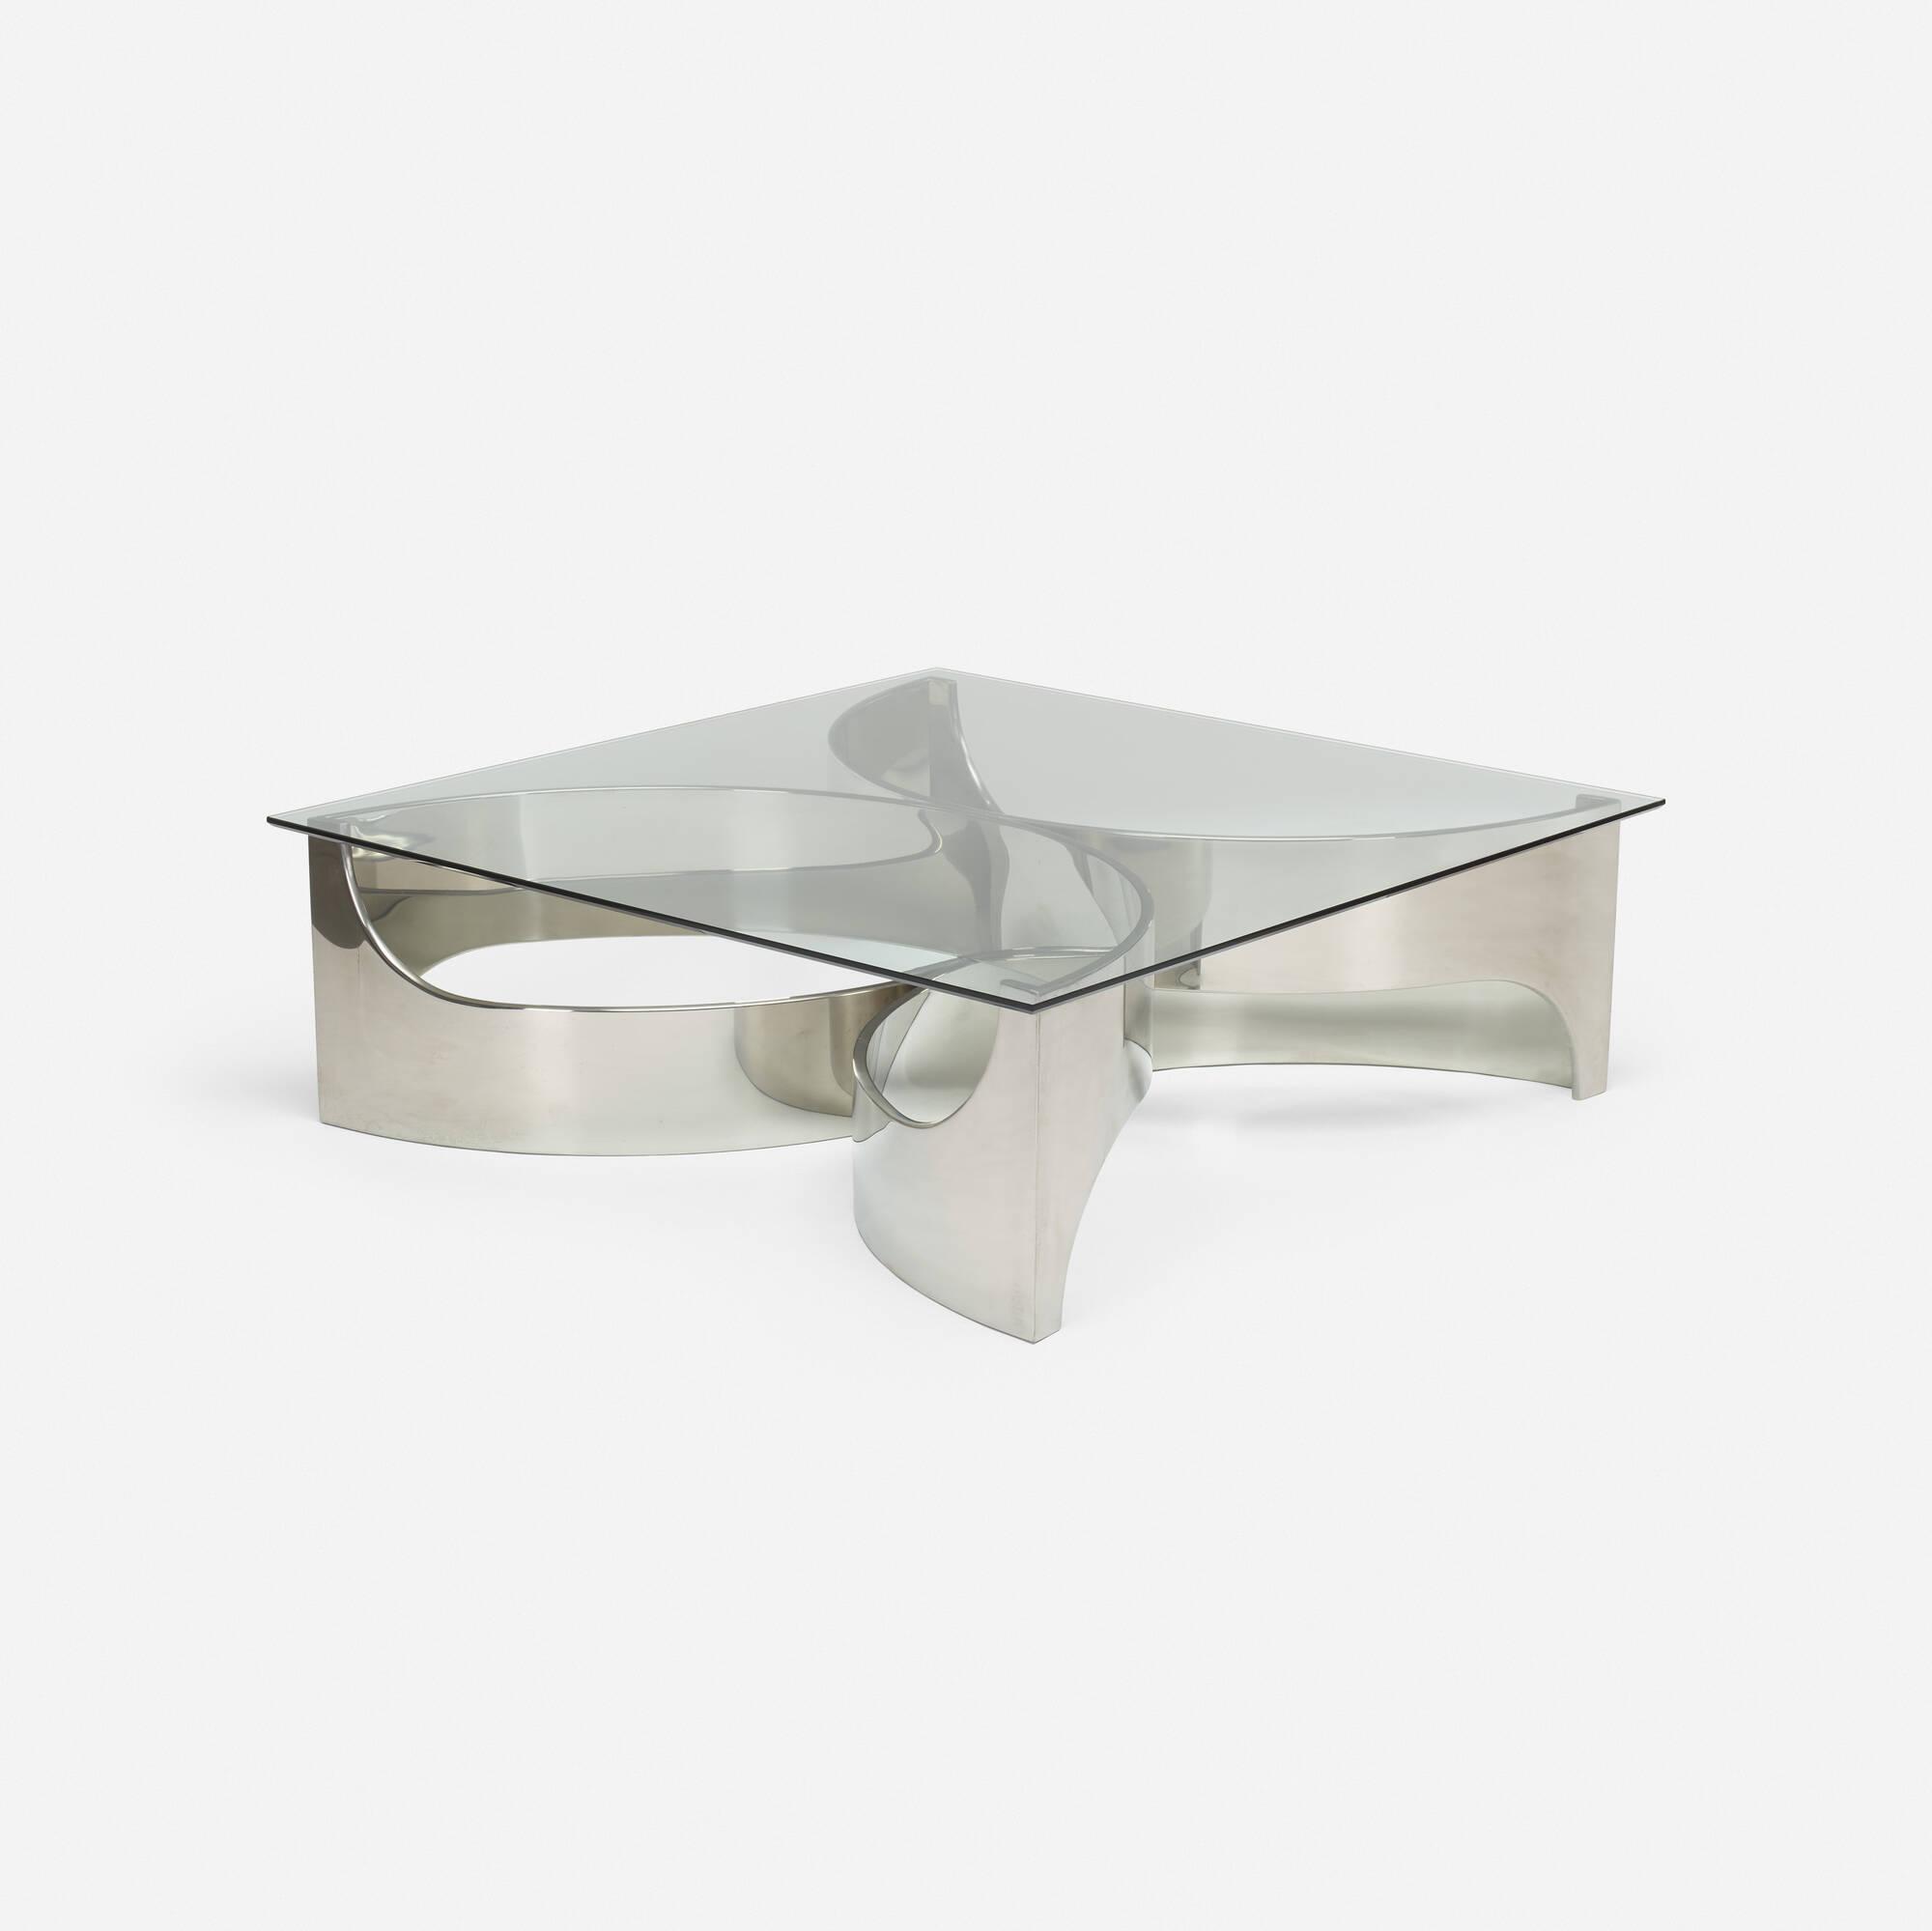 337: Maxform / coffee table (1 of 3)